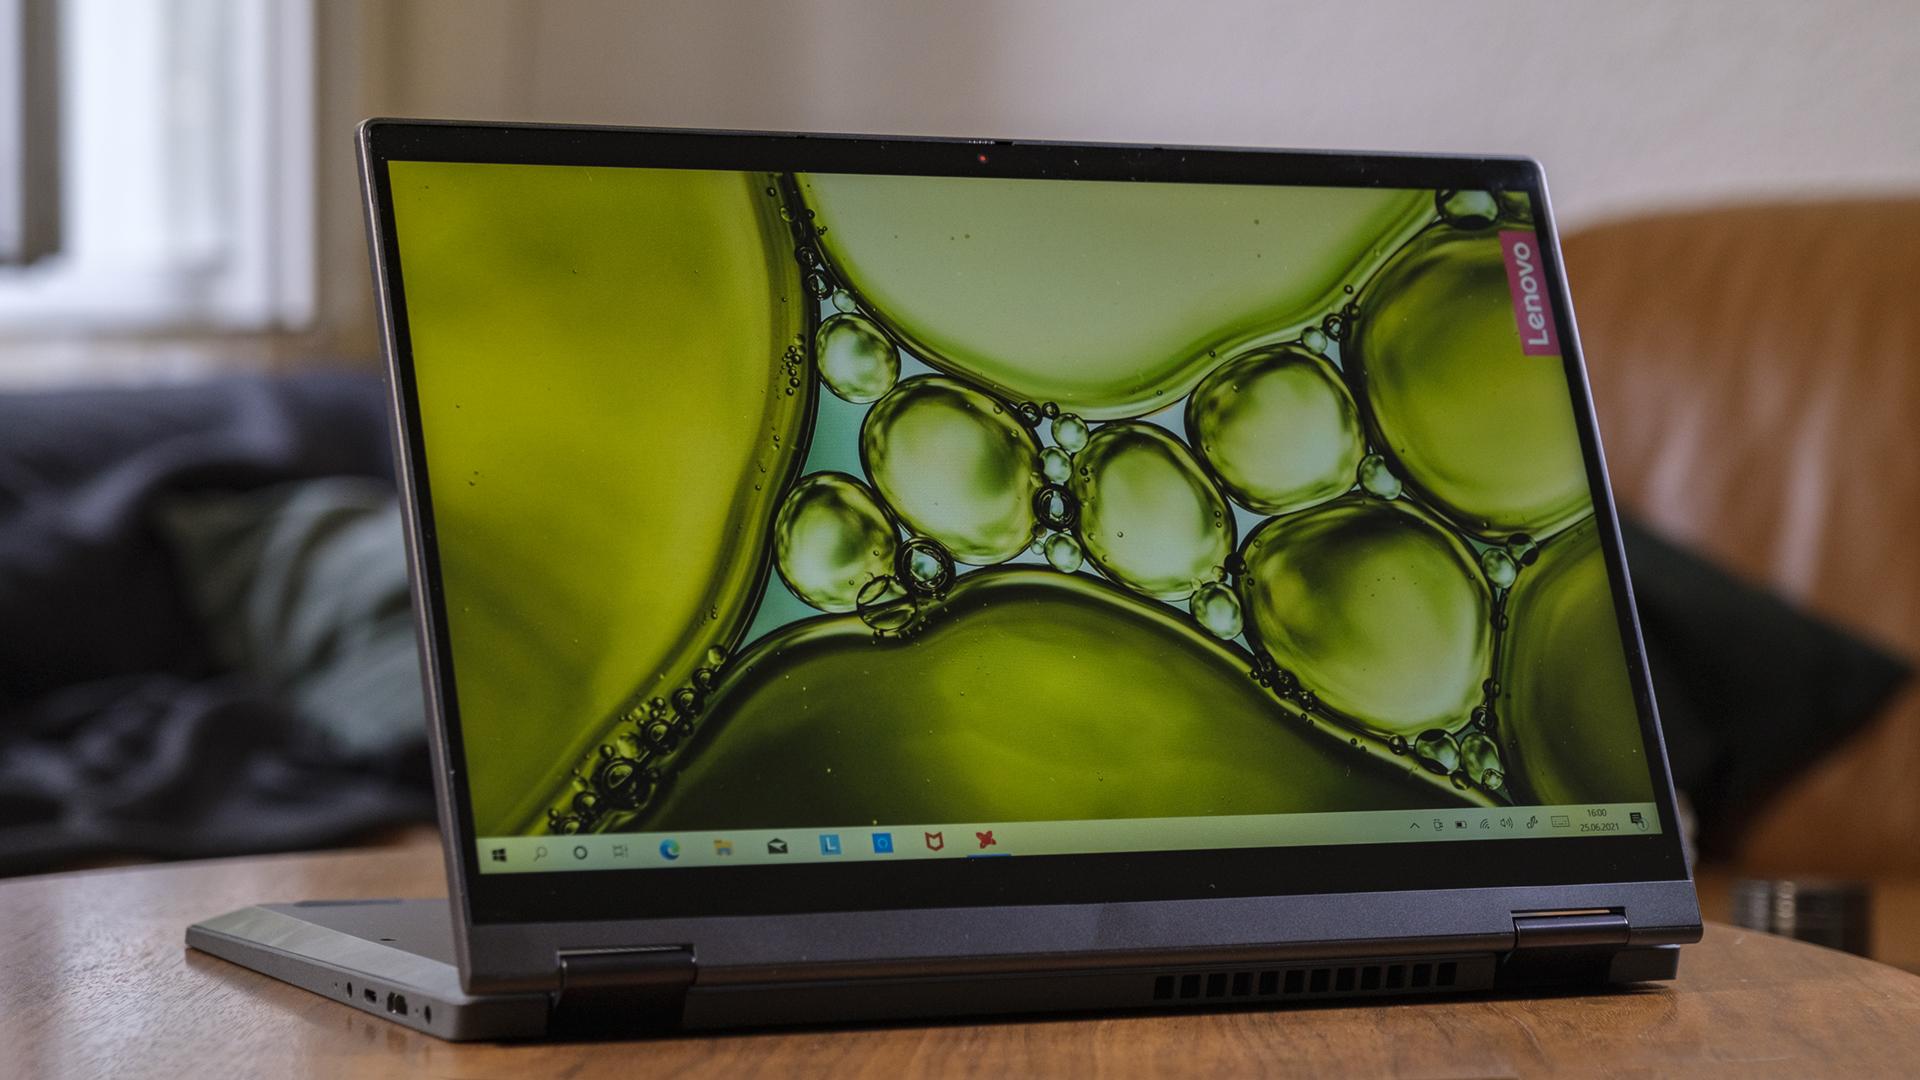 Lenovo IdeaPad Flex 5 AMD Ryzen 5700U Display